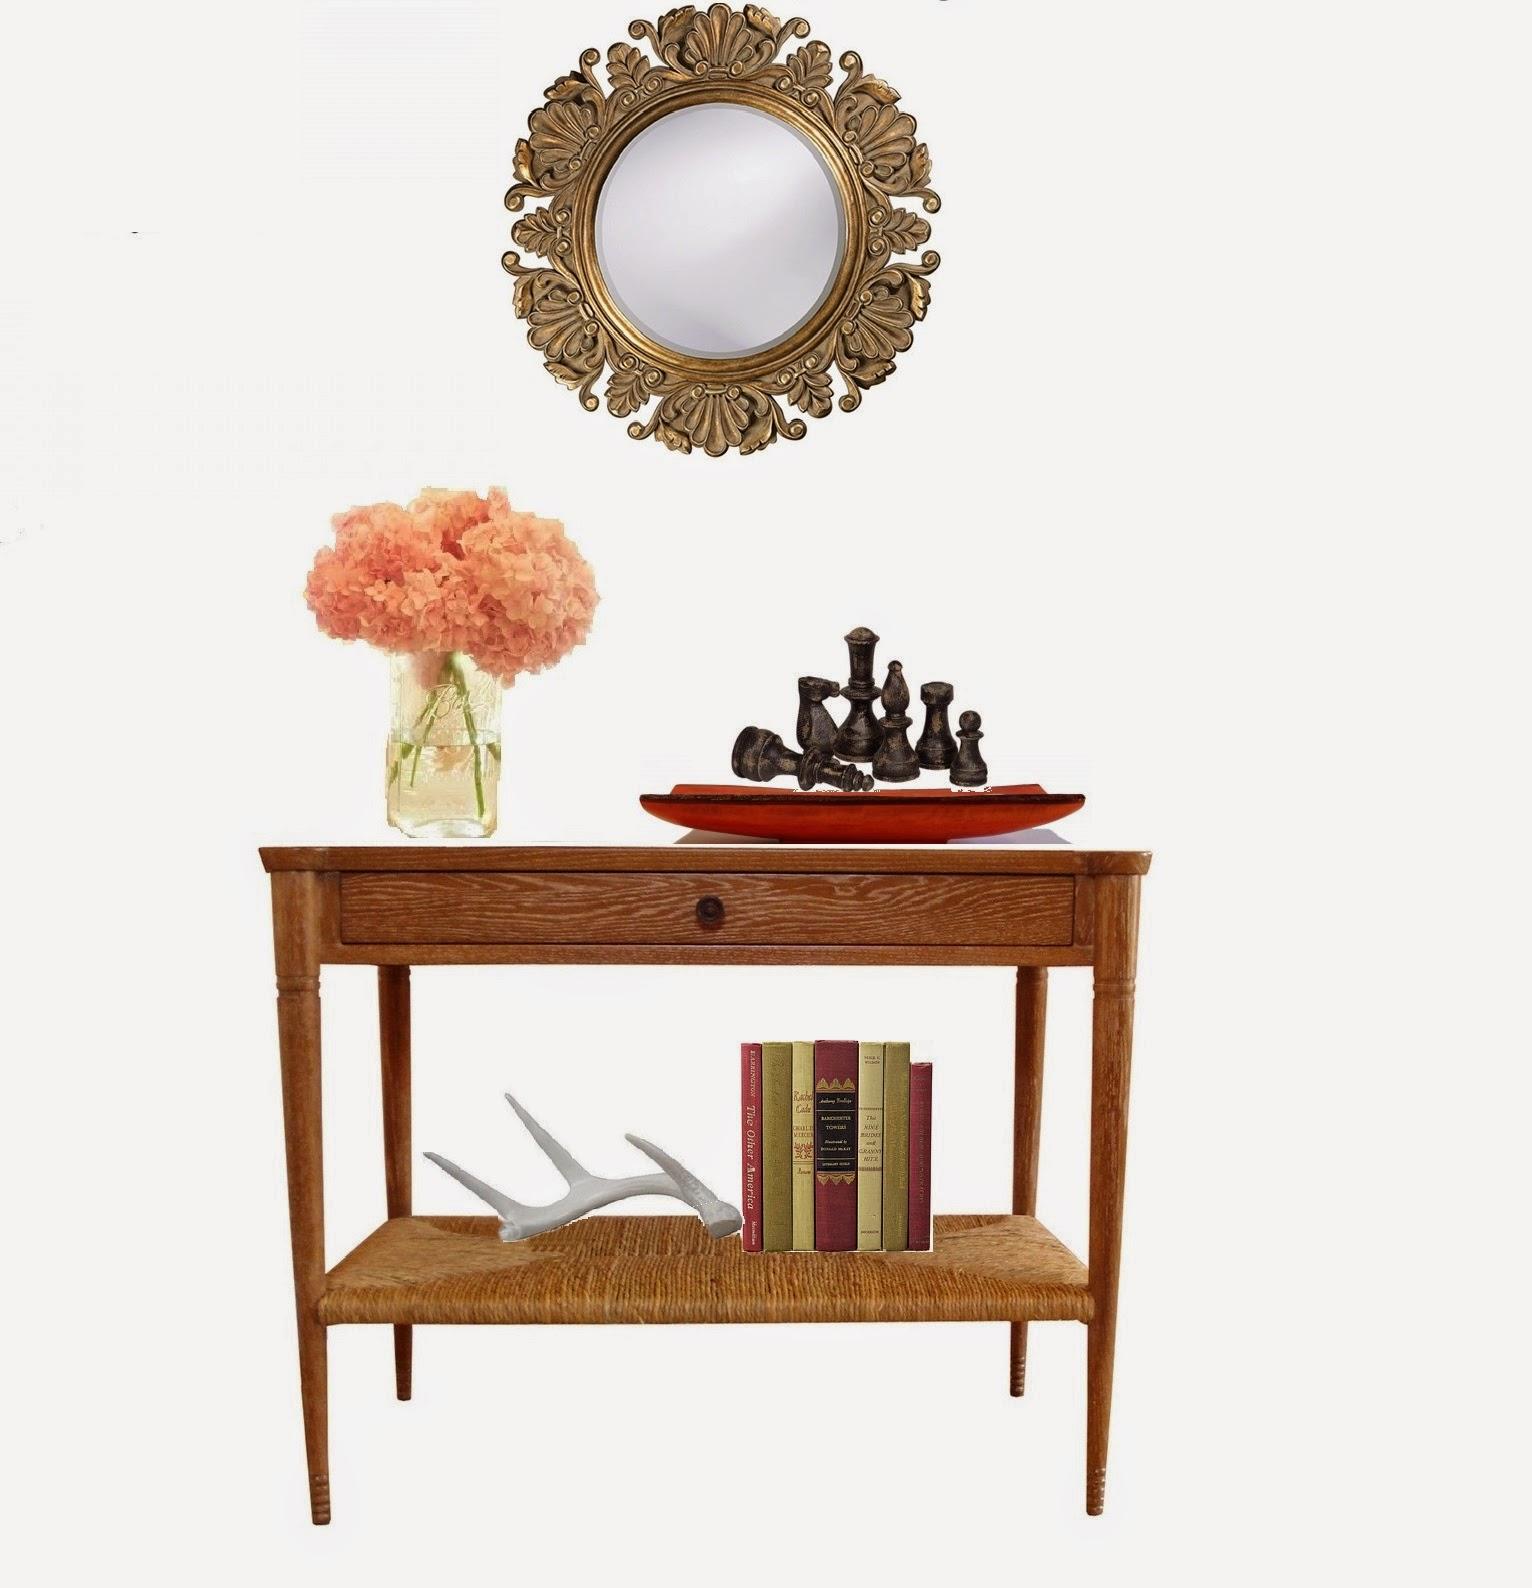 Meg-made Creations: End Table Decor Ideas - Bring ...